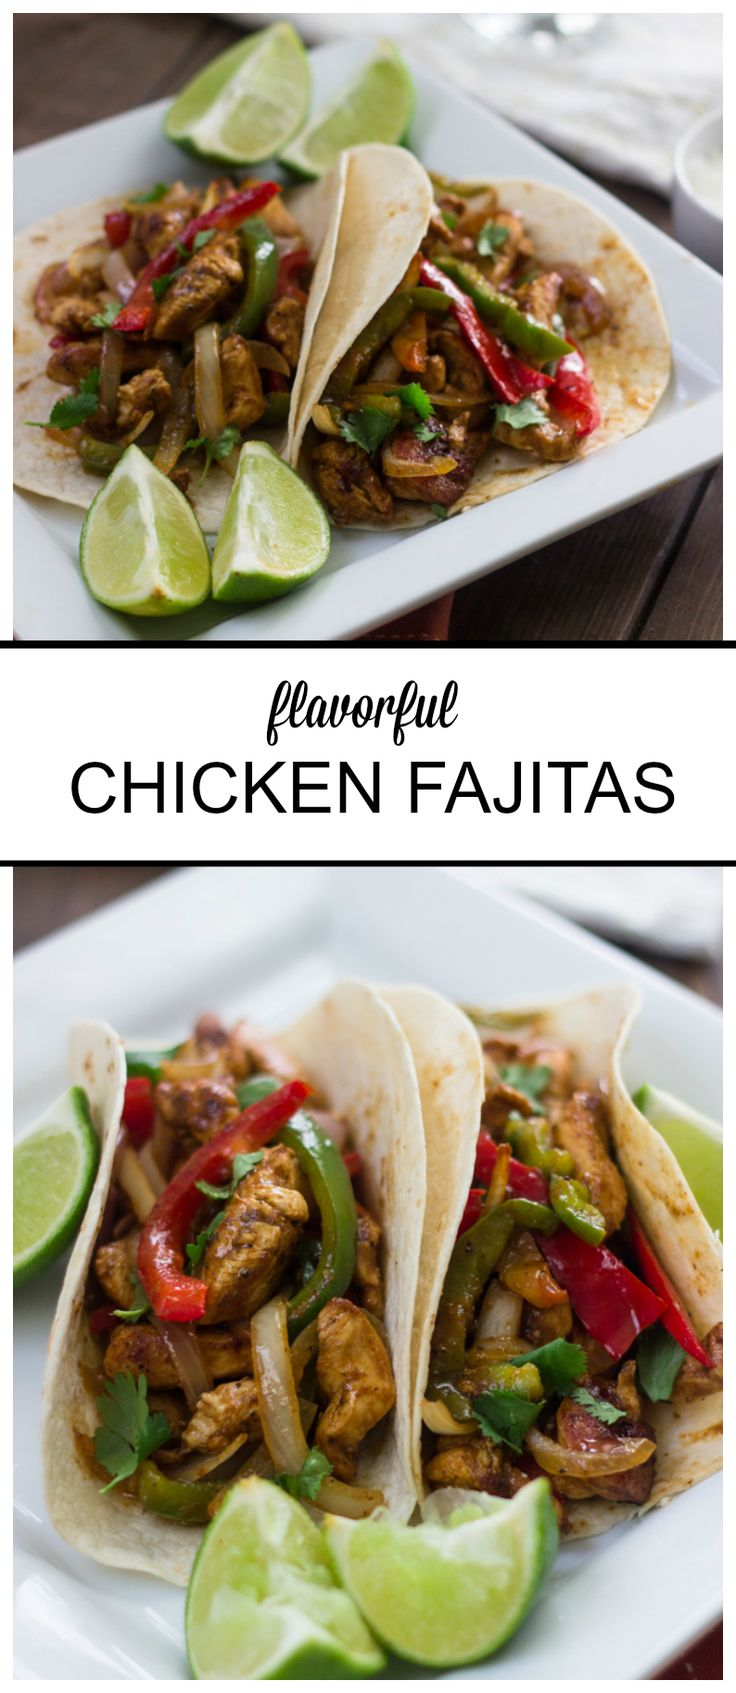 20 Minute Flavorful Chicken Fajitas